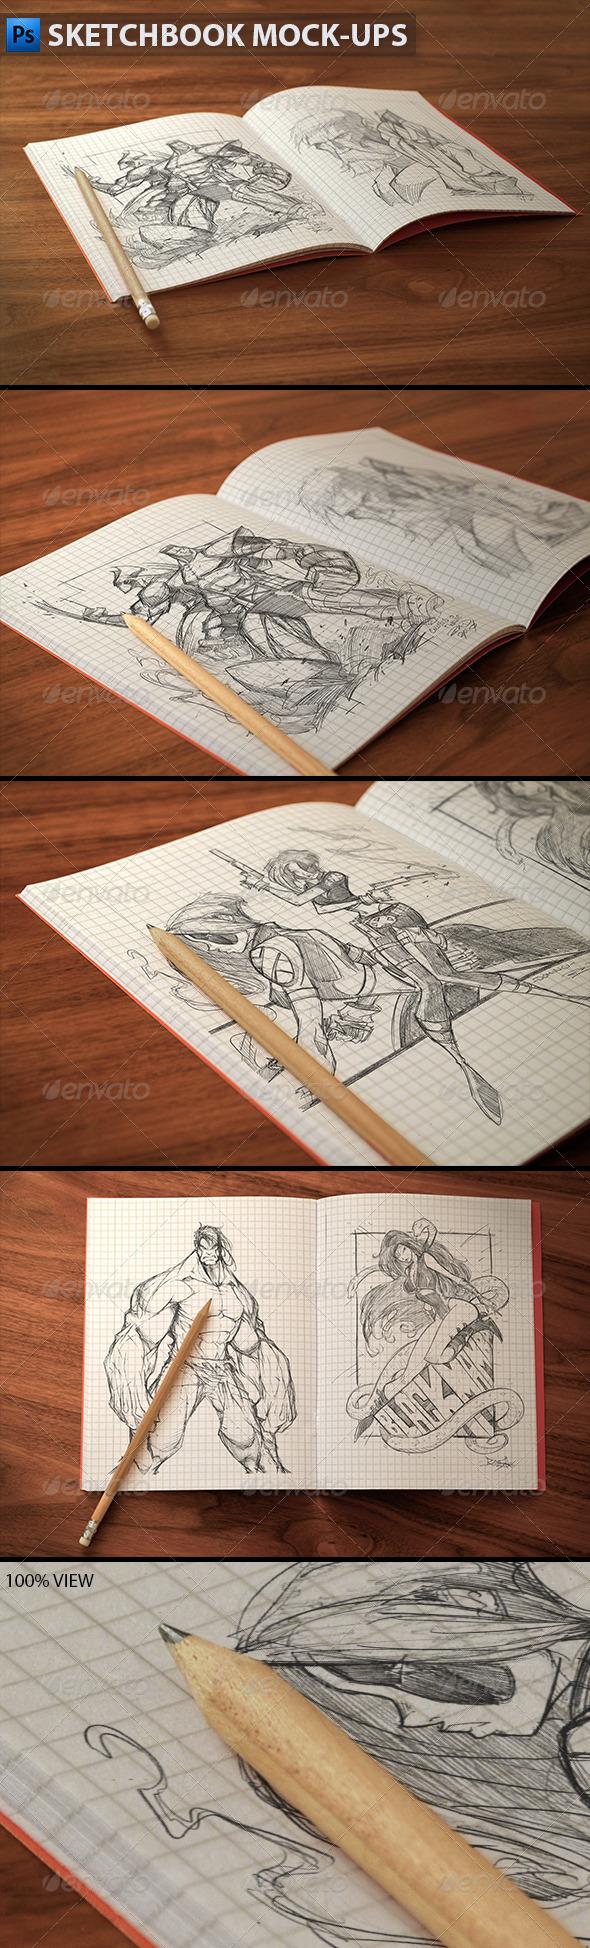 Sketchbook Mock-ups - Product Mock-Ups Graphics